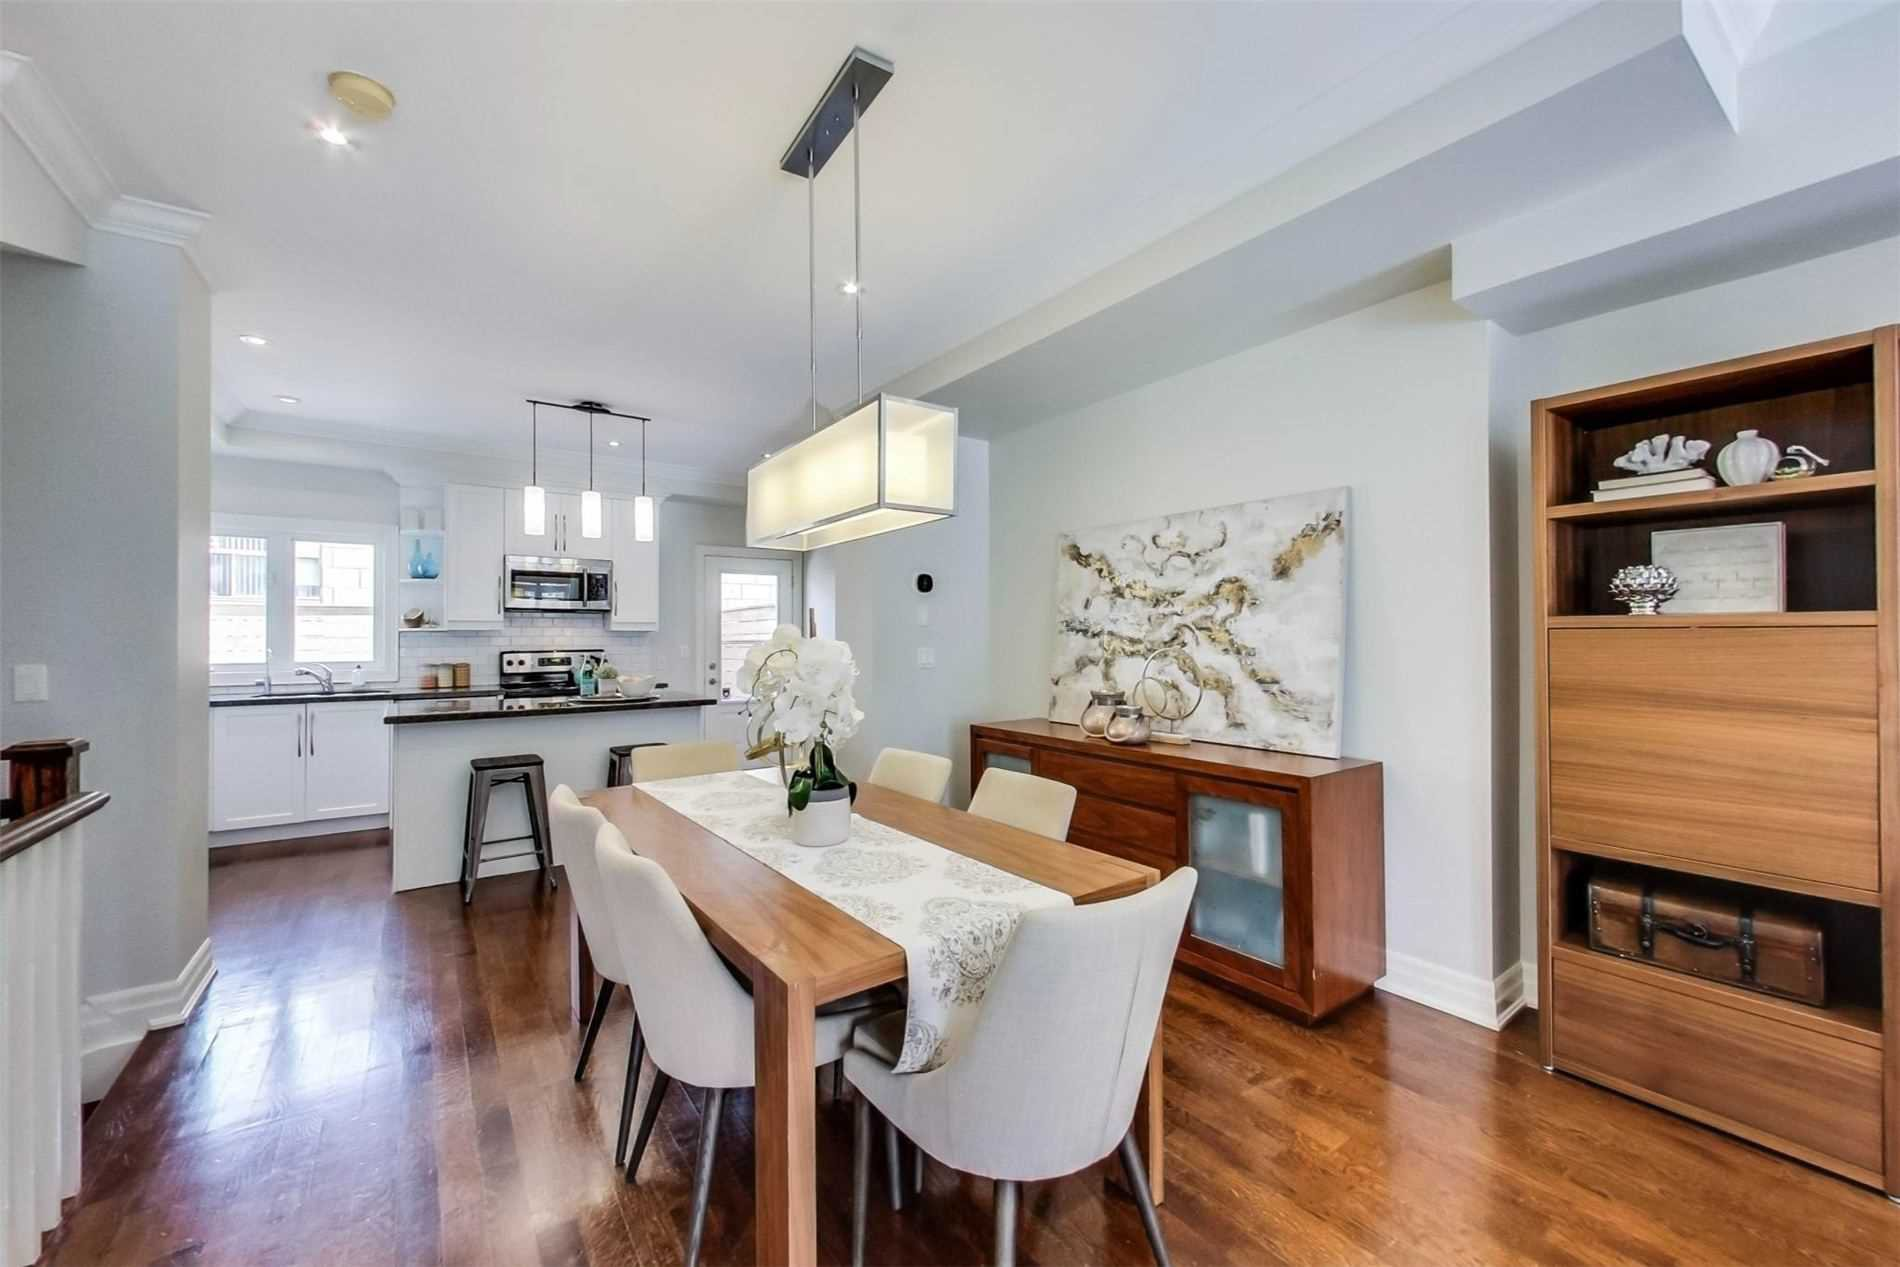 Photo 7: Photos: 213 Heward Avenue in Toronto: South Riverdale House (3-Storey) for sale (Toronto E01)  : MLS®# E4941877